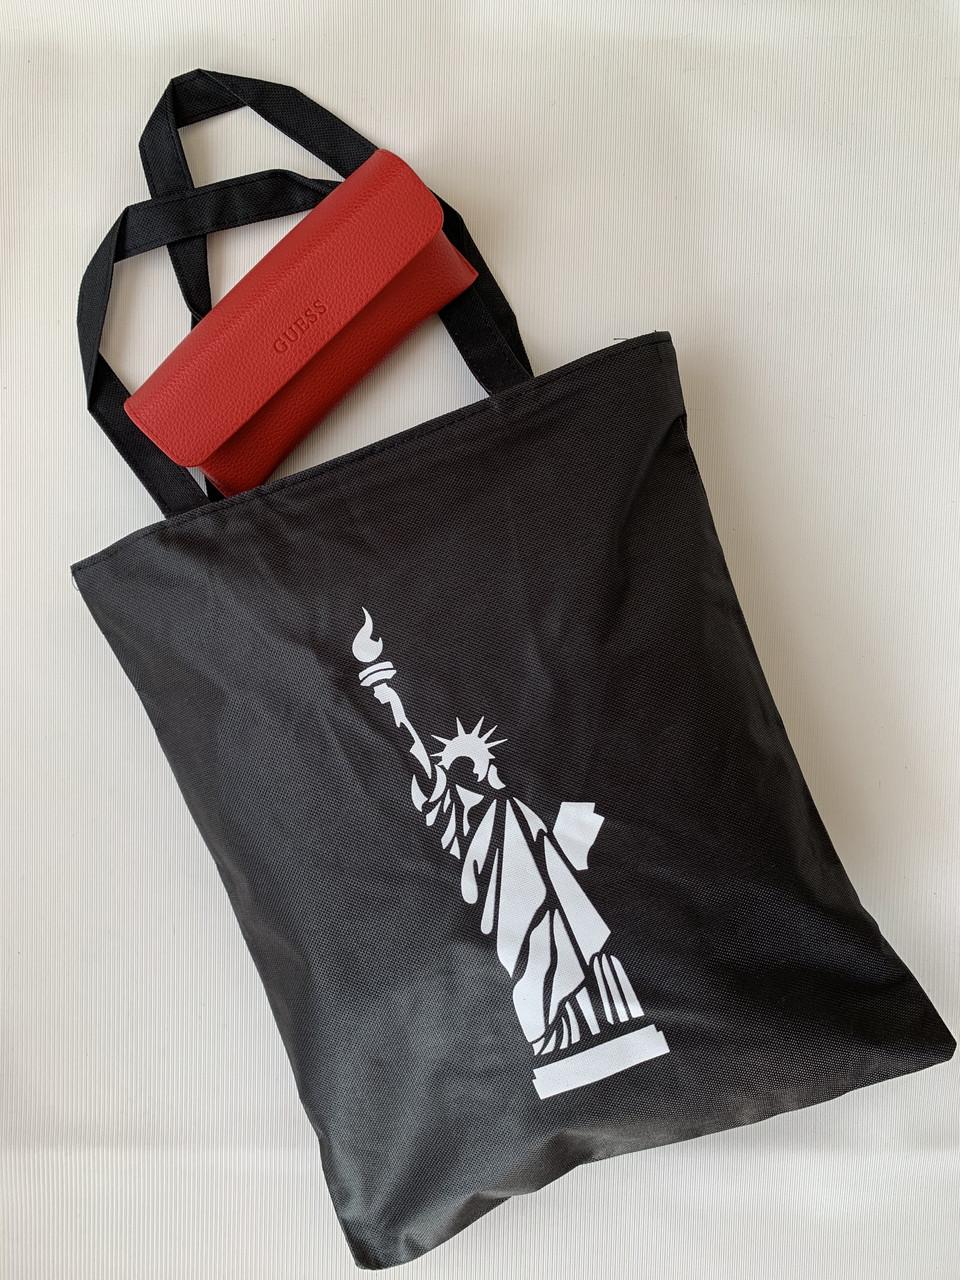 Молодіжна чорна екосумка шоппер з тканини з принтом Статуї Свободи